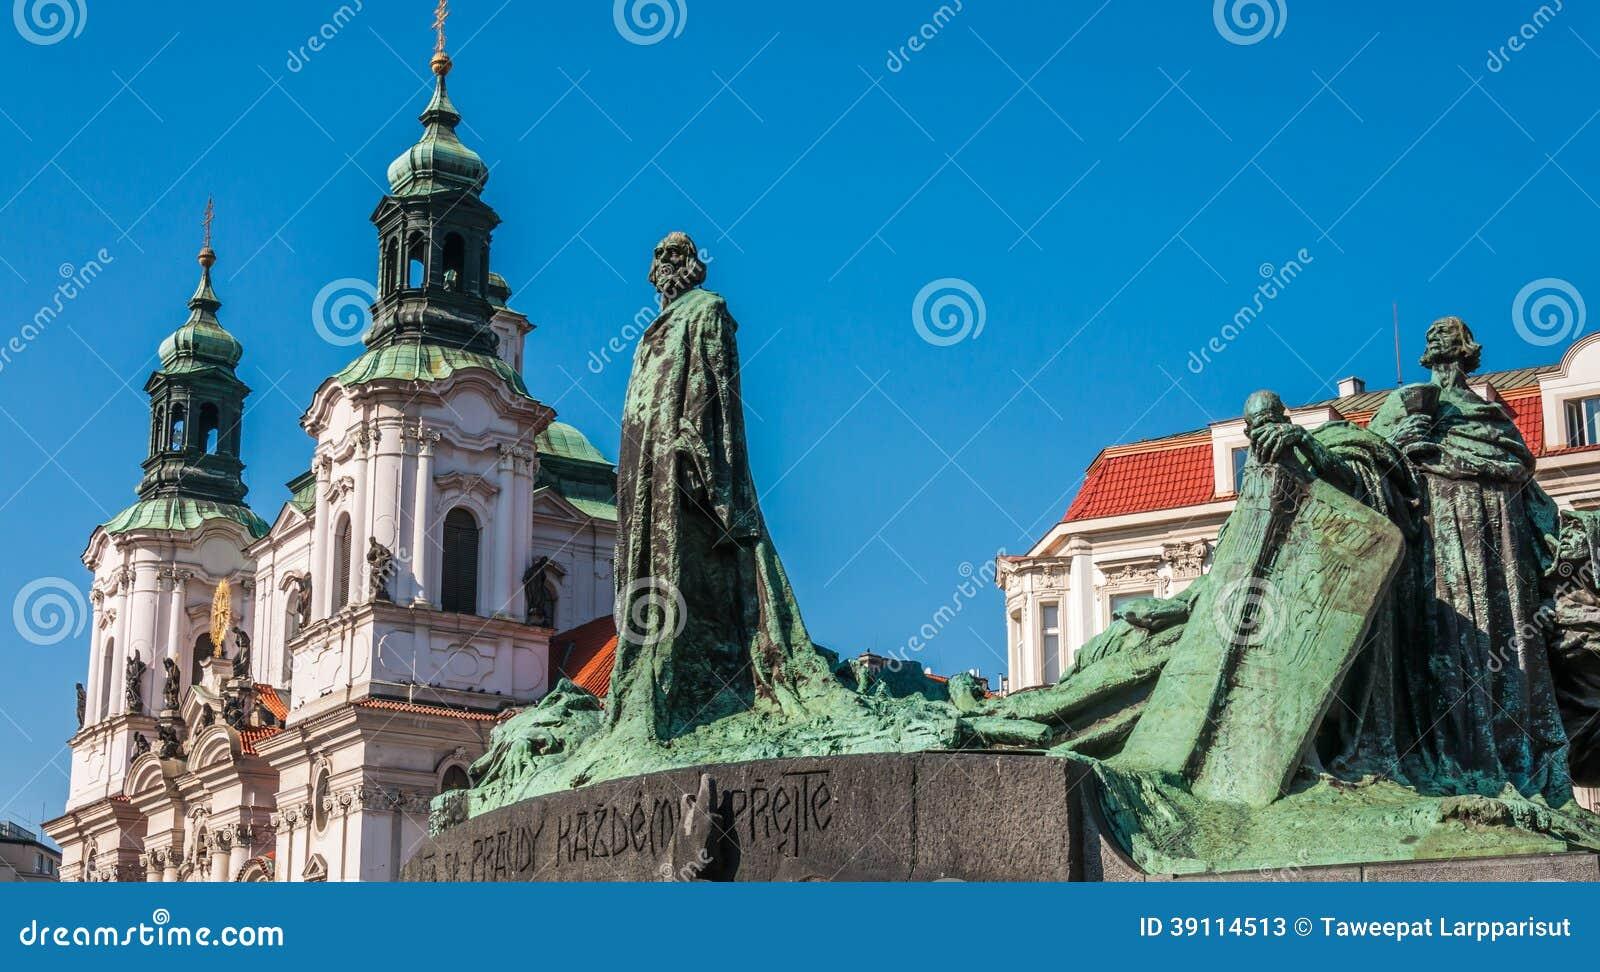 Jan Hus-monument